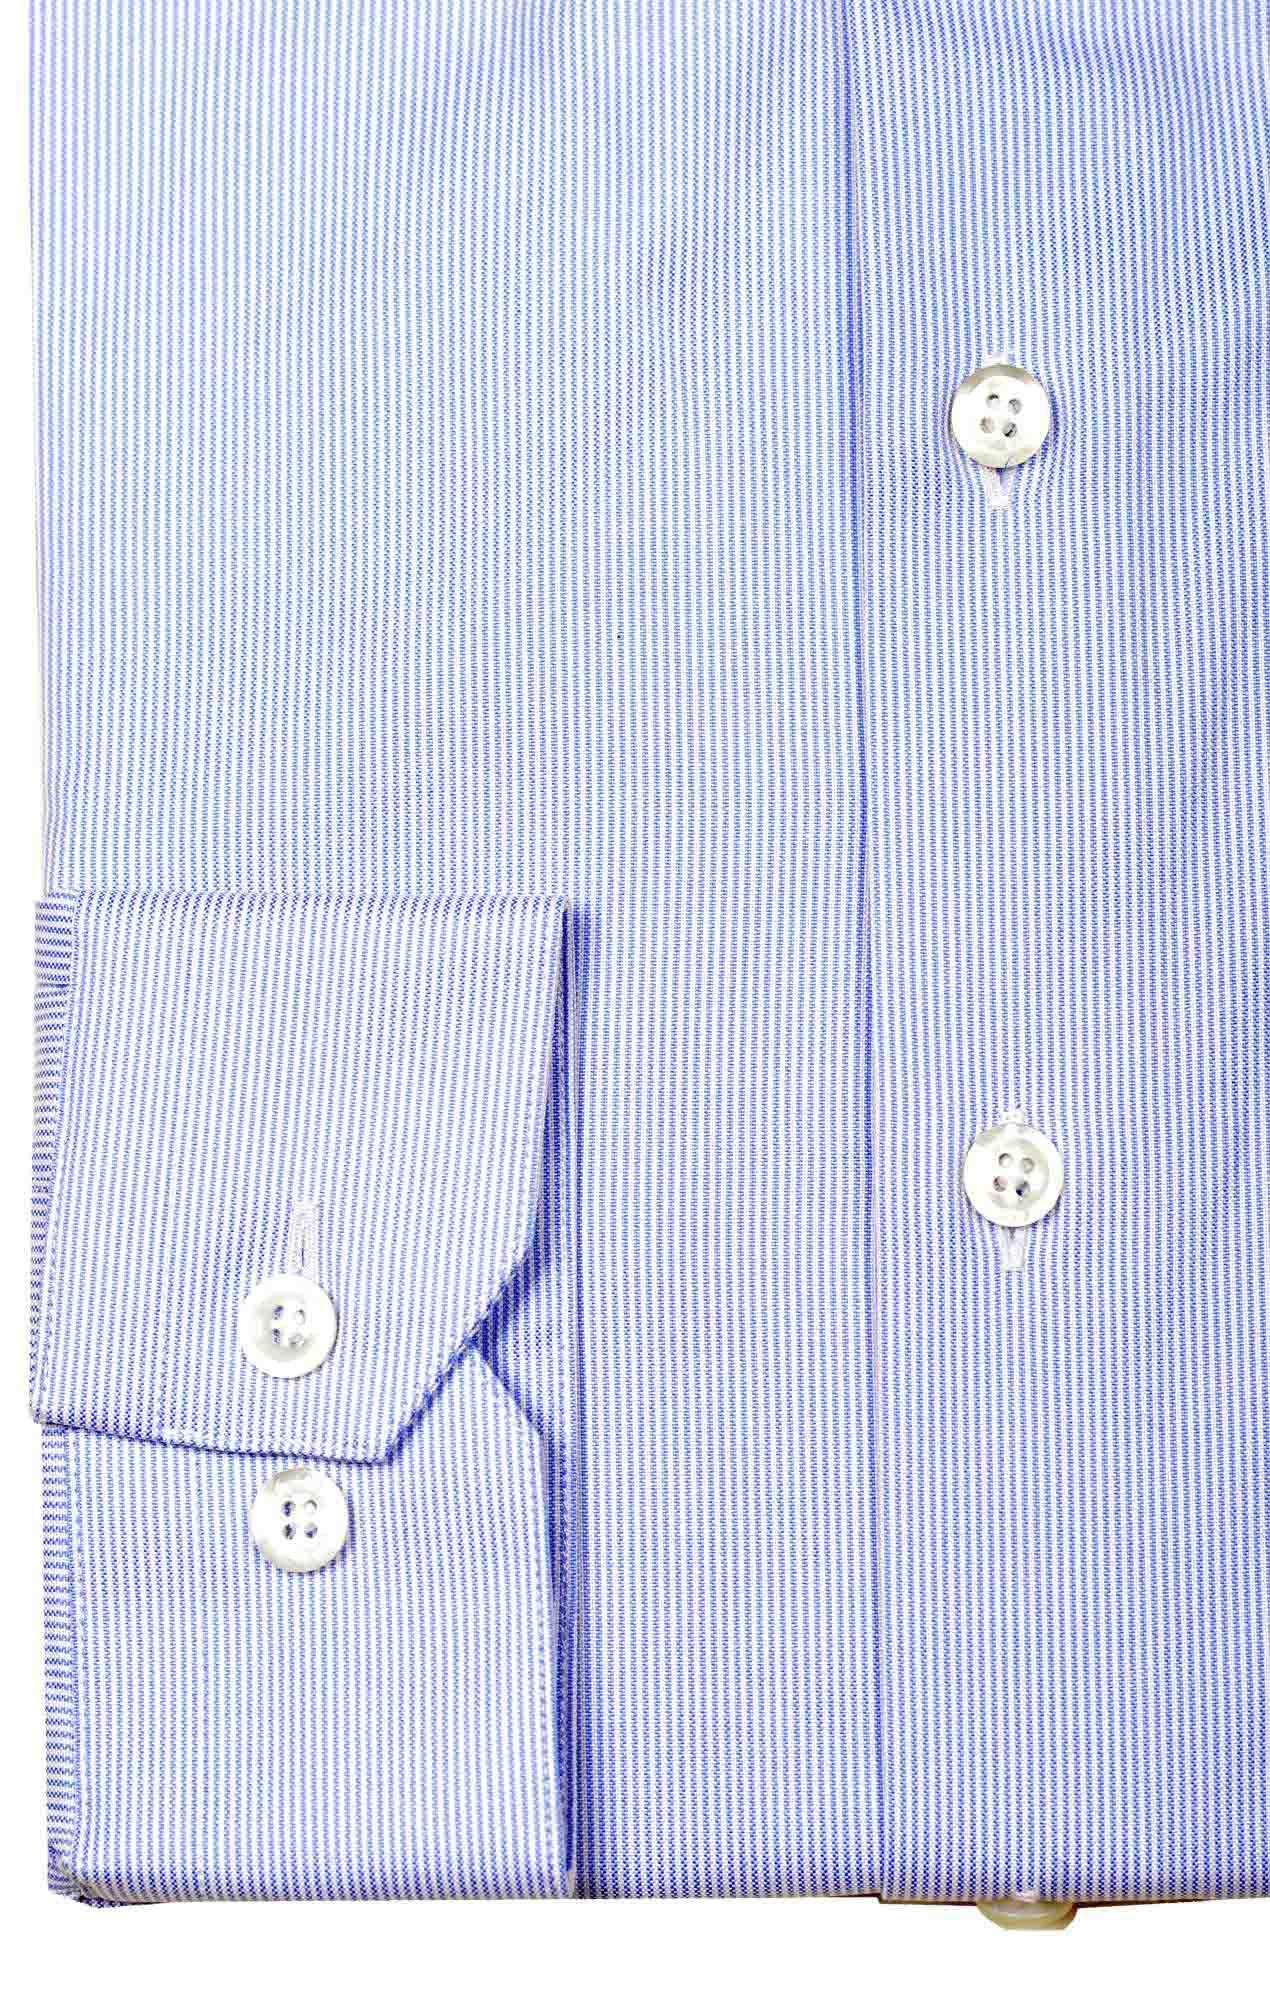 Striped blue shirt